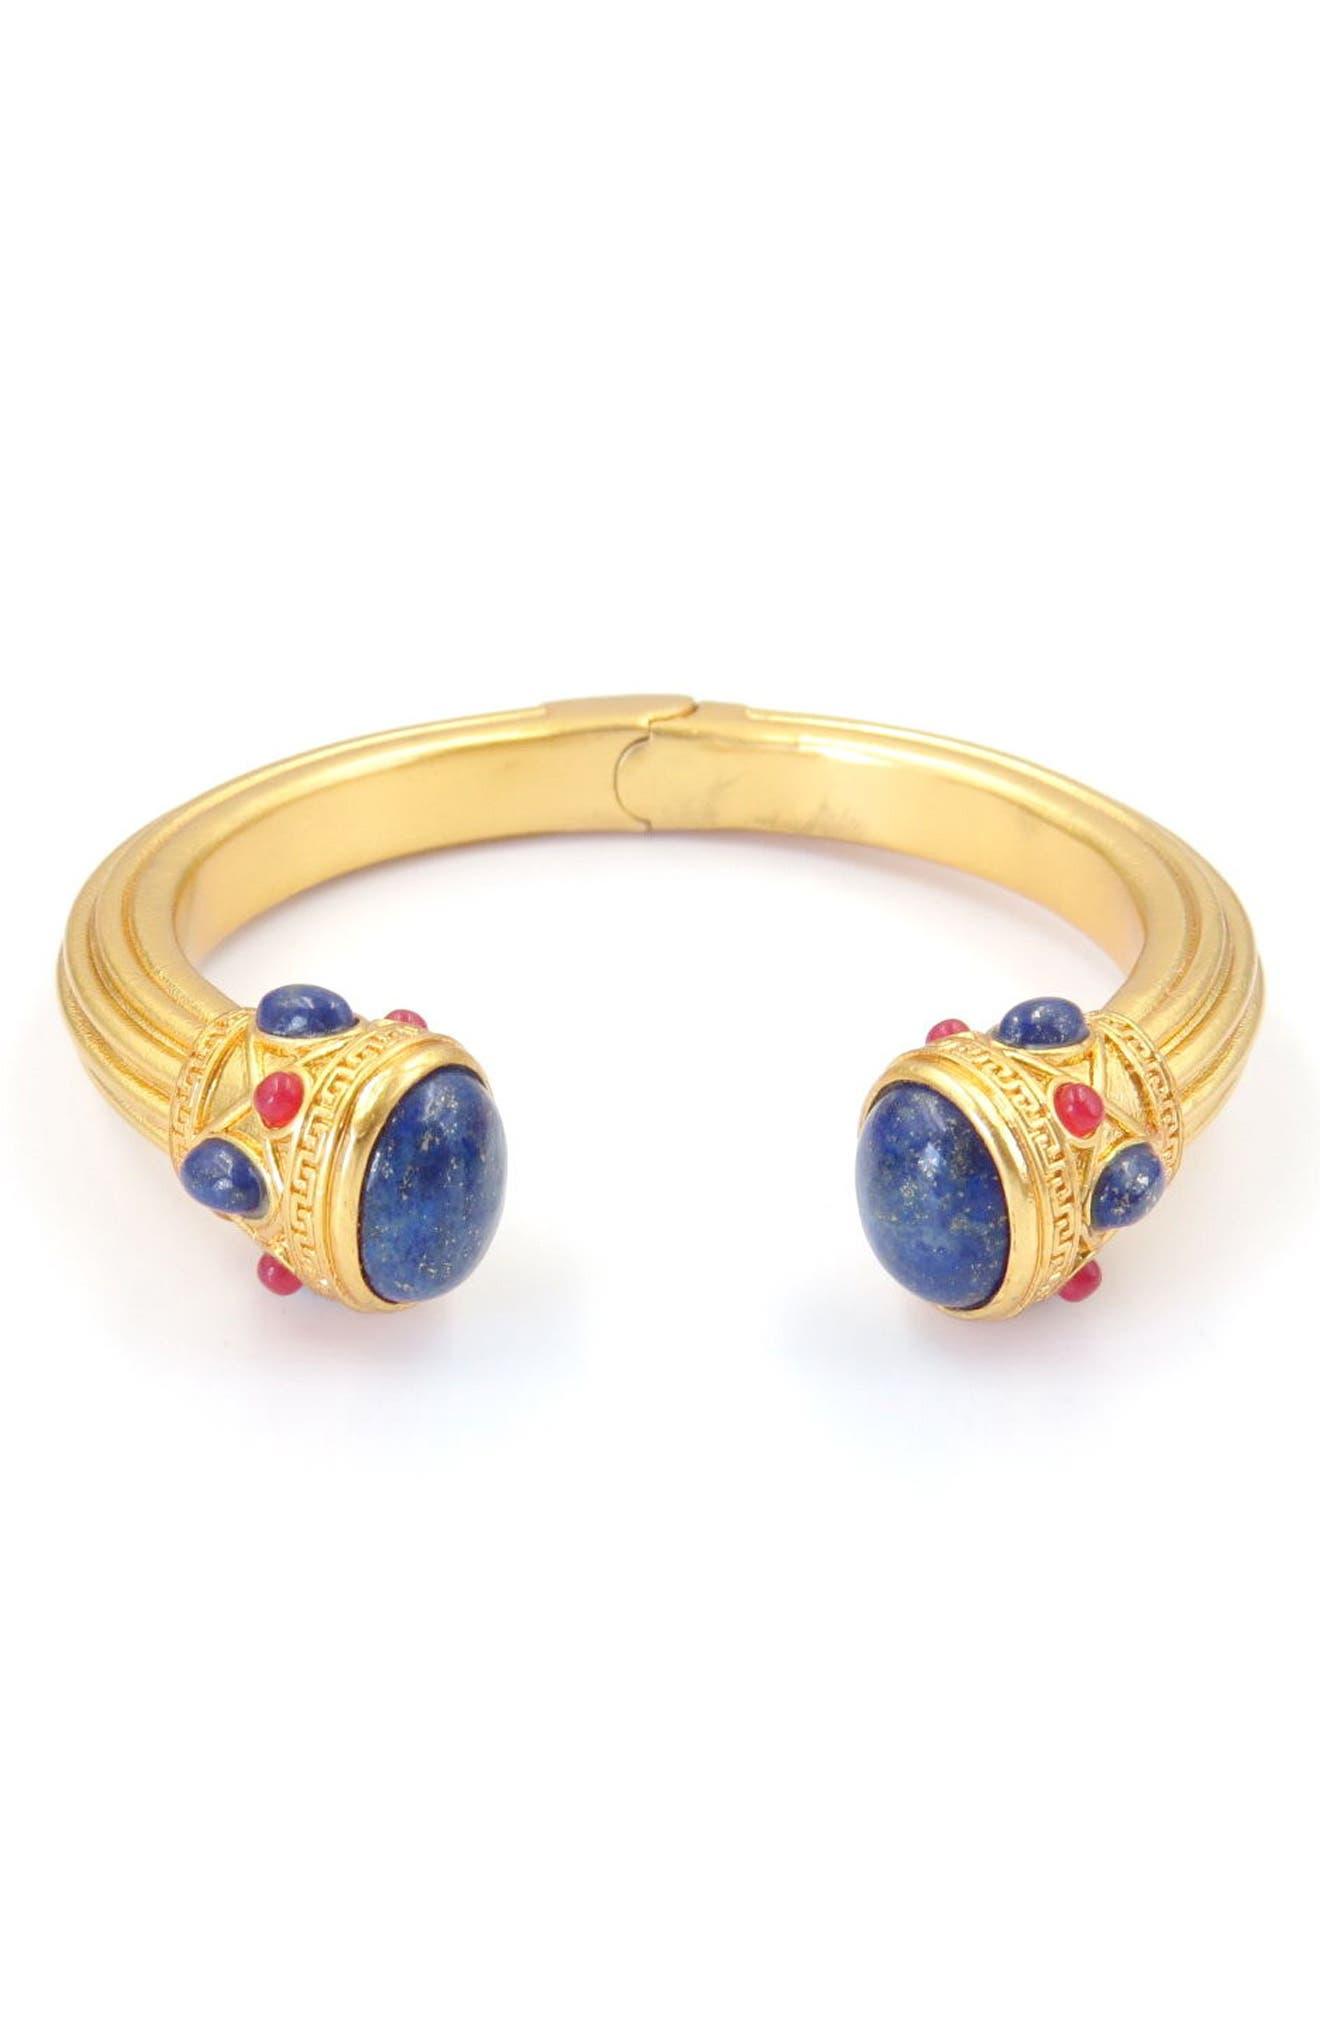 Asa Kaftans Lapis & Quartzite Cuff Bracelet